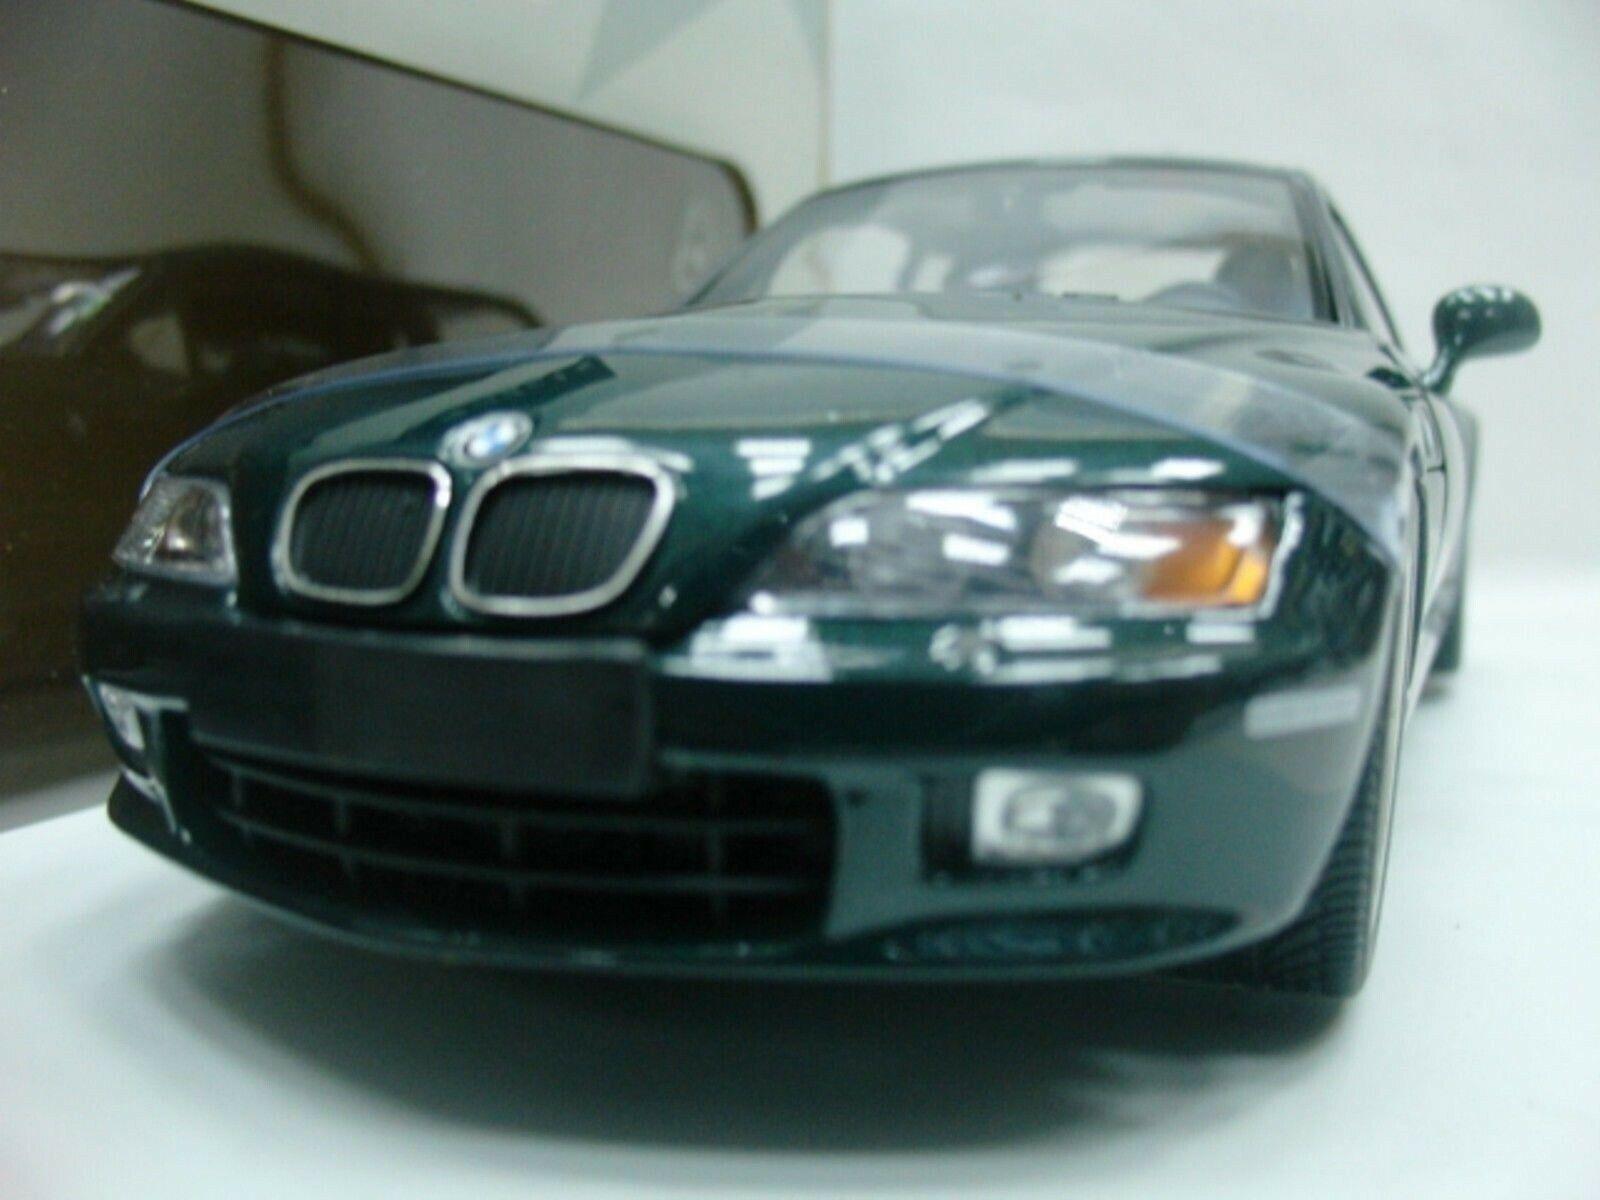 Wow extremamujerte raro BMW Z3 2.8 Coupe 24V 1998 Oxford verde 1 18 UT-Auto Art M Gtr